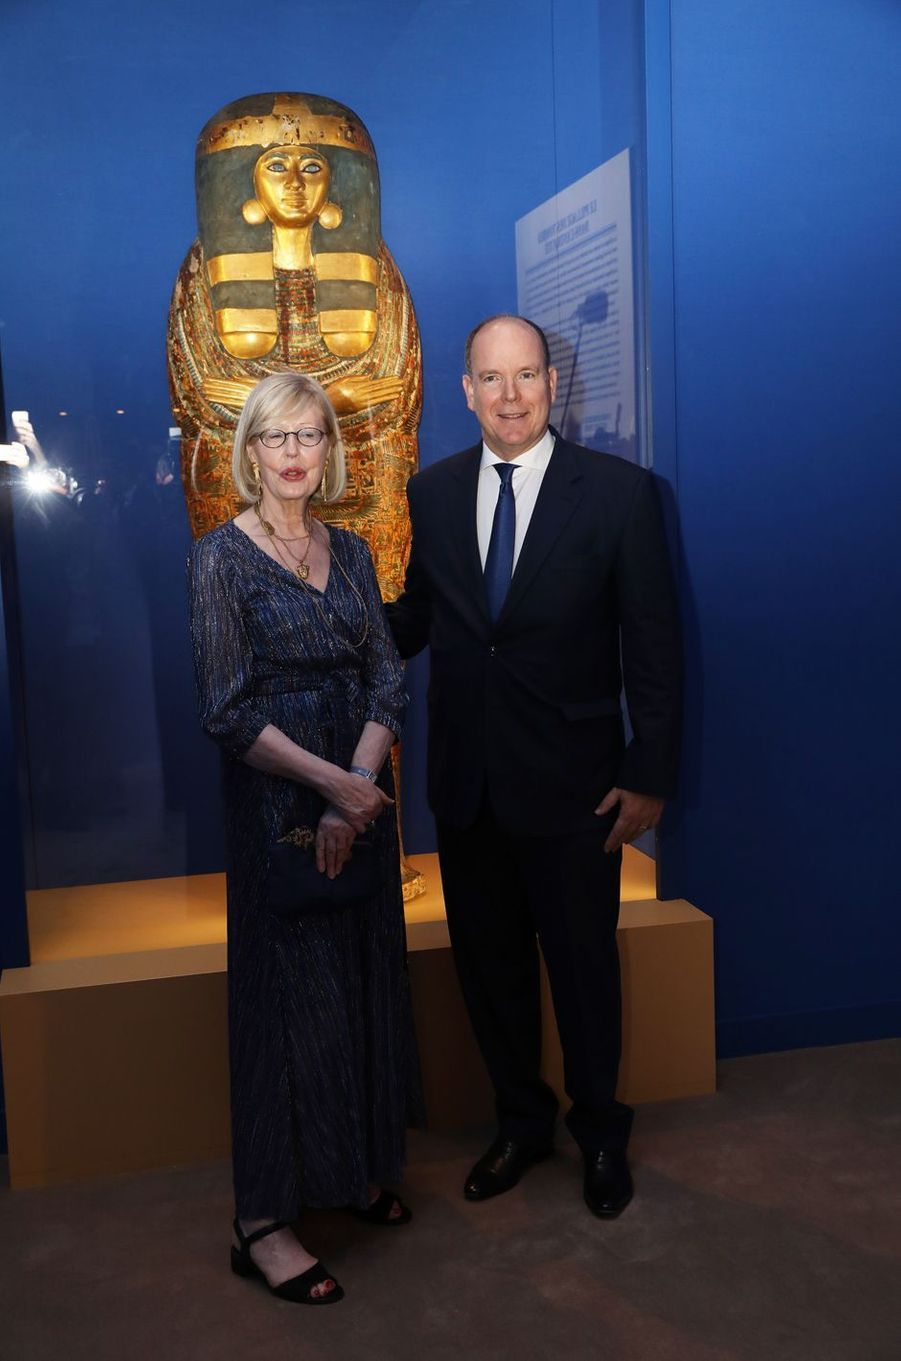 Le prince Albert II de Monaco avec Christiane Ziegler à Monaco, le 6 juillet 2018